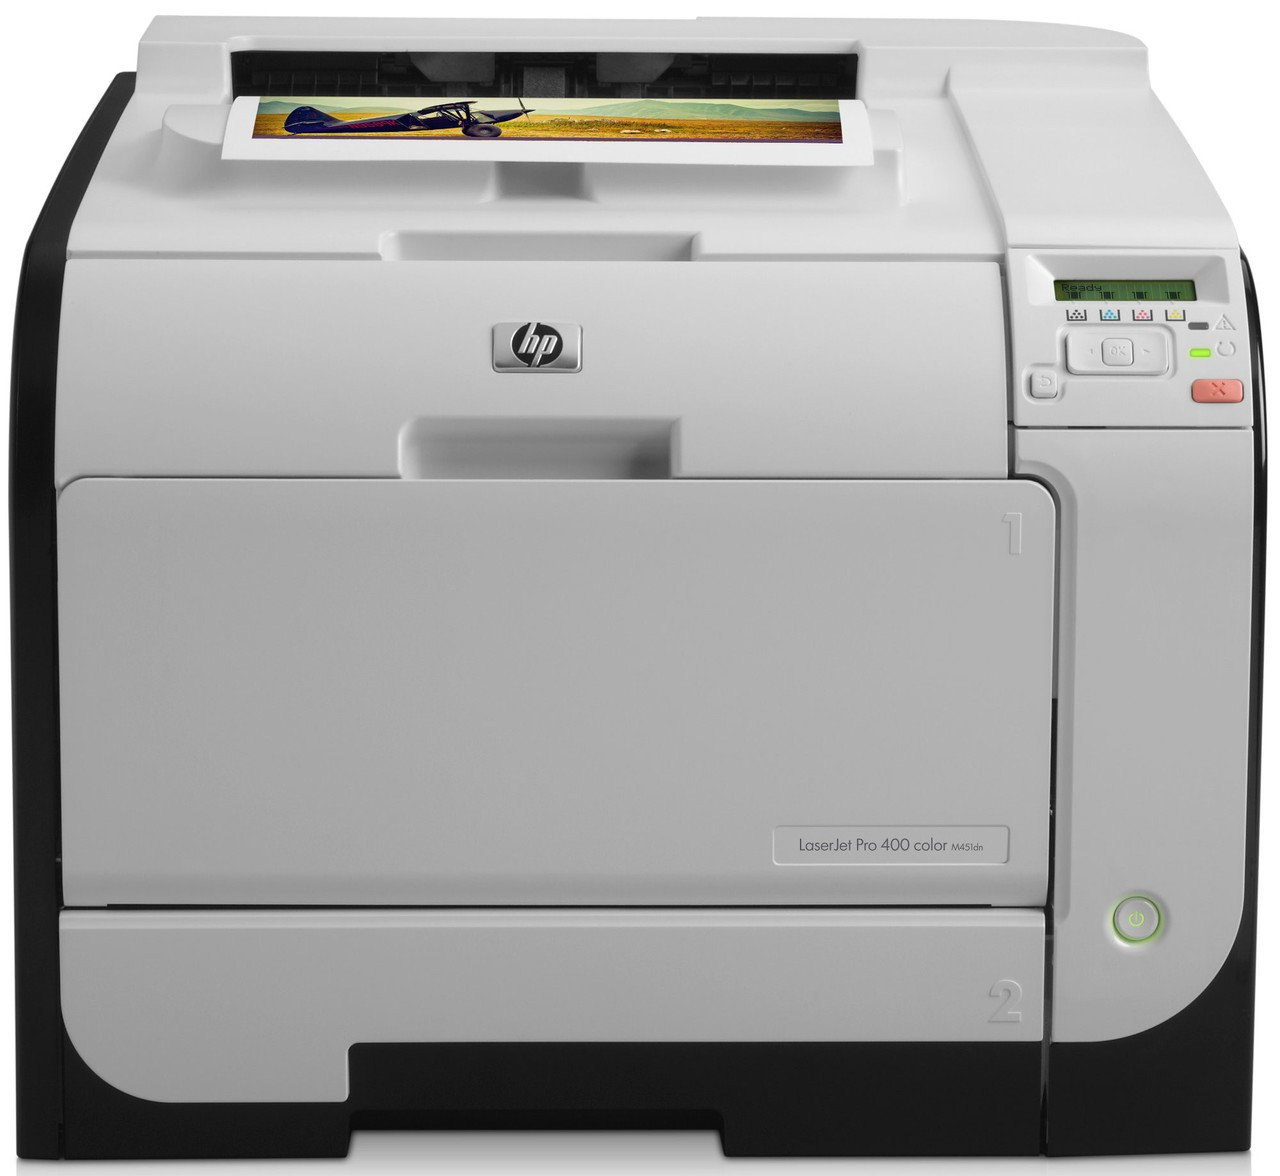 hp laserjet pro 400 mfp service manual